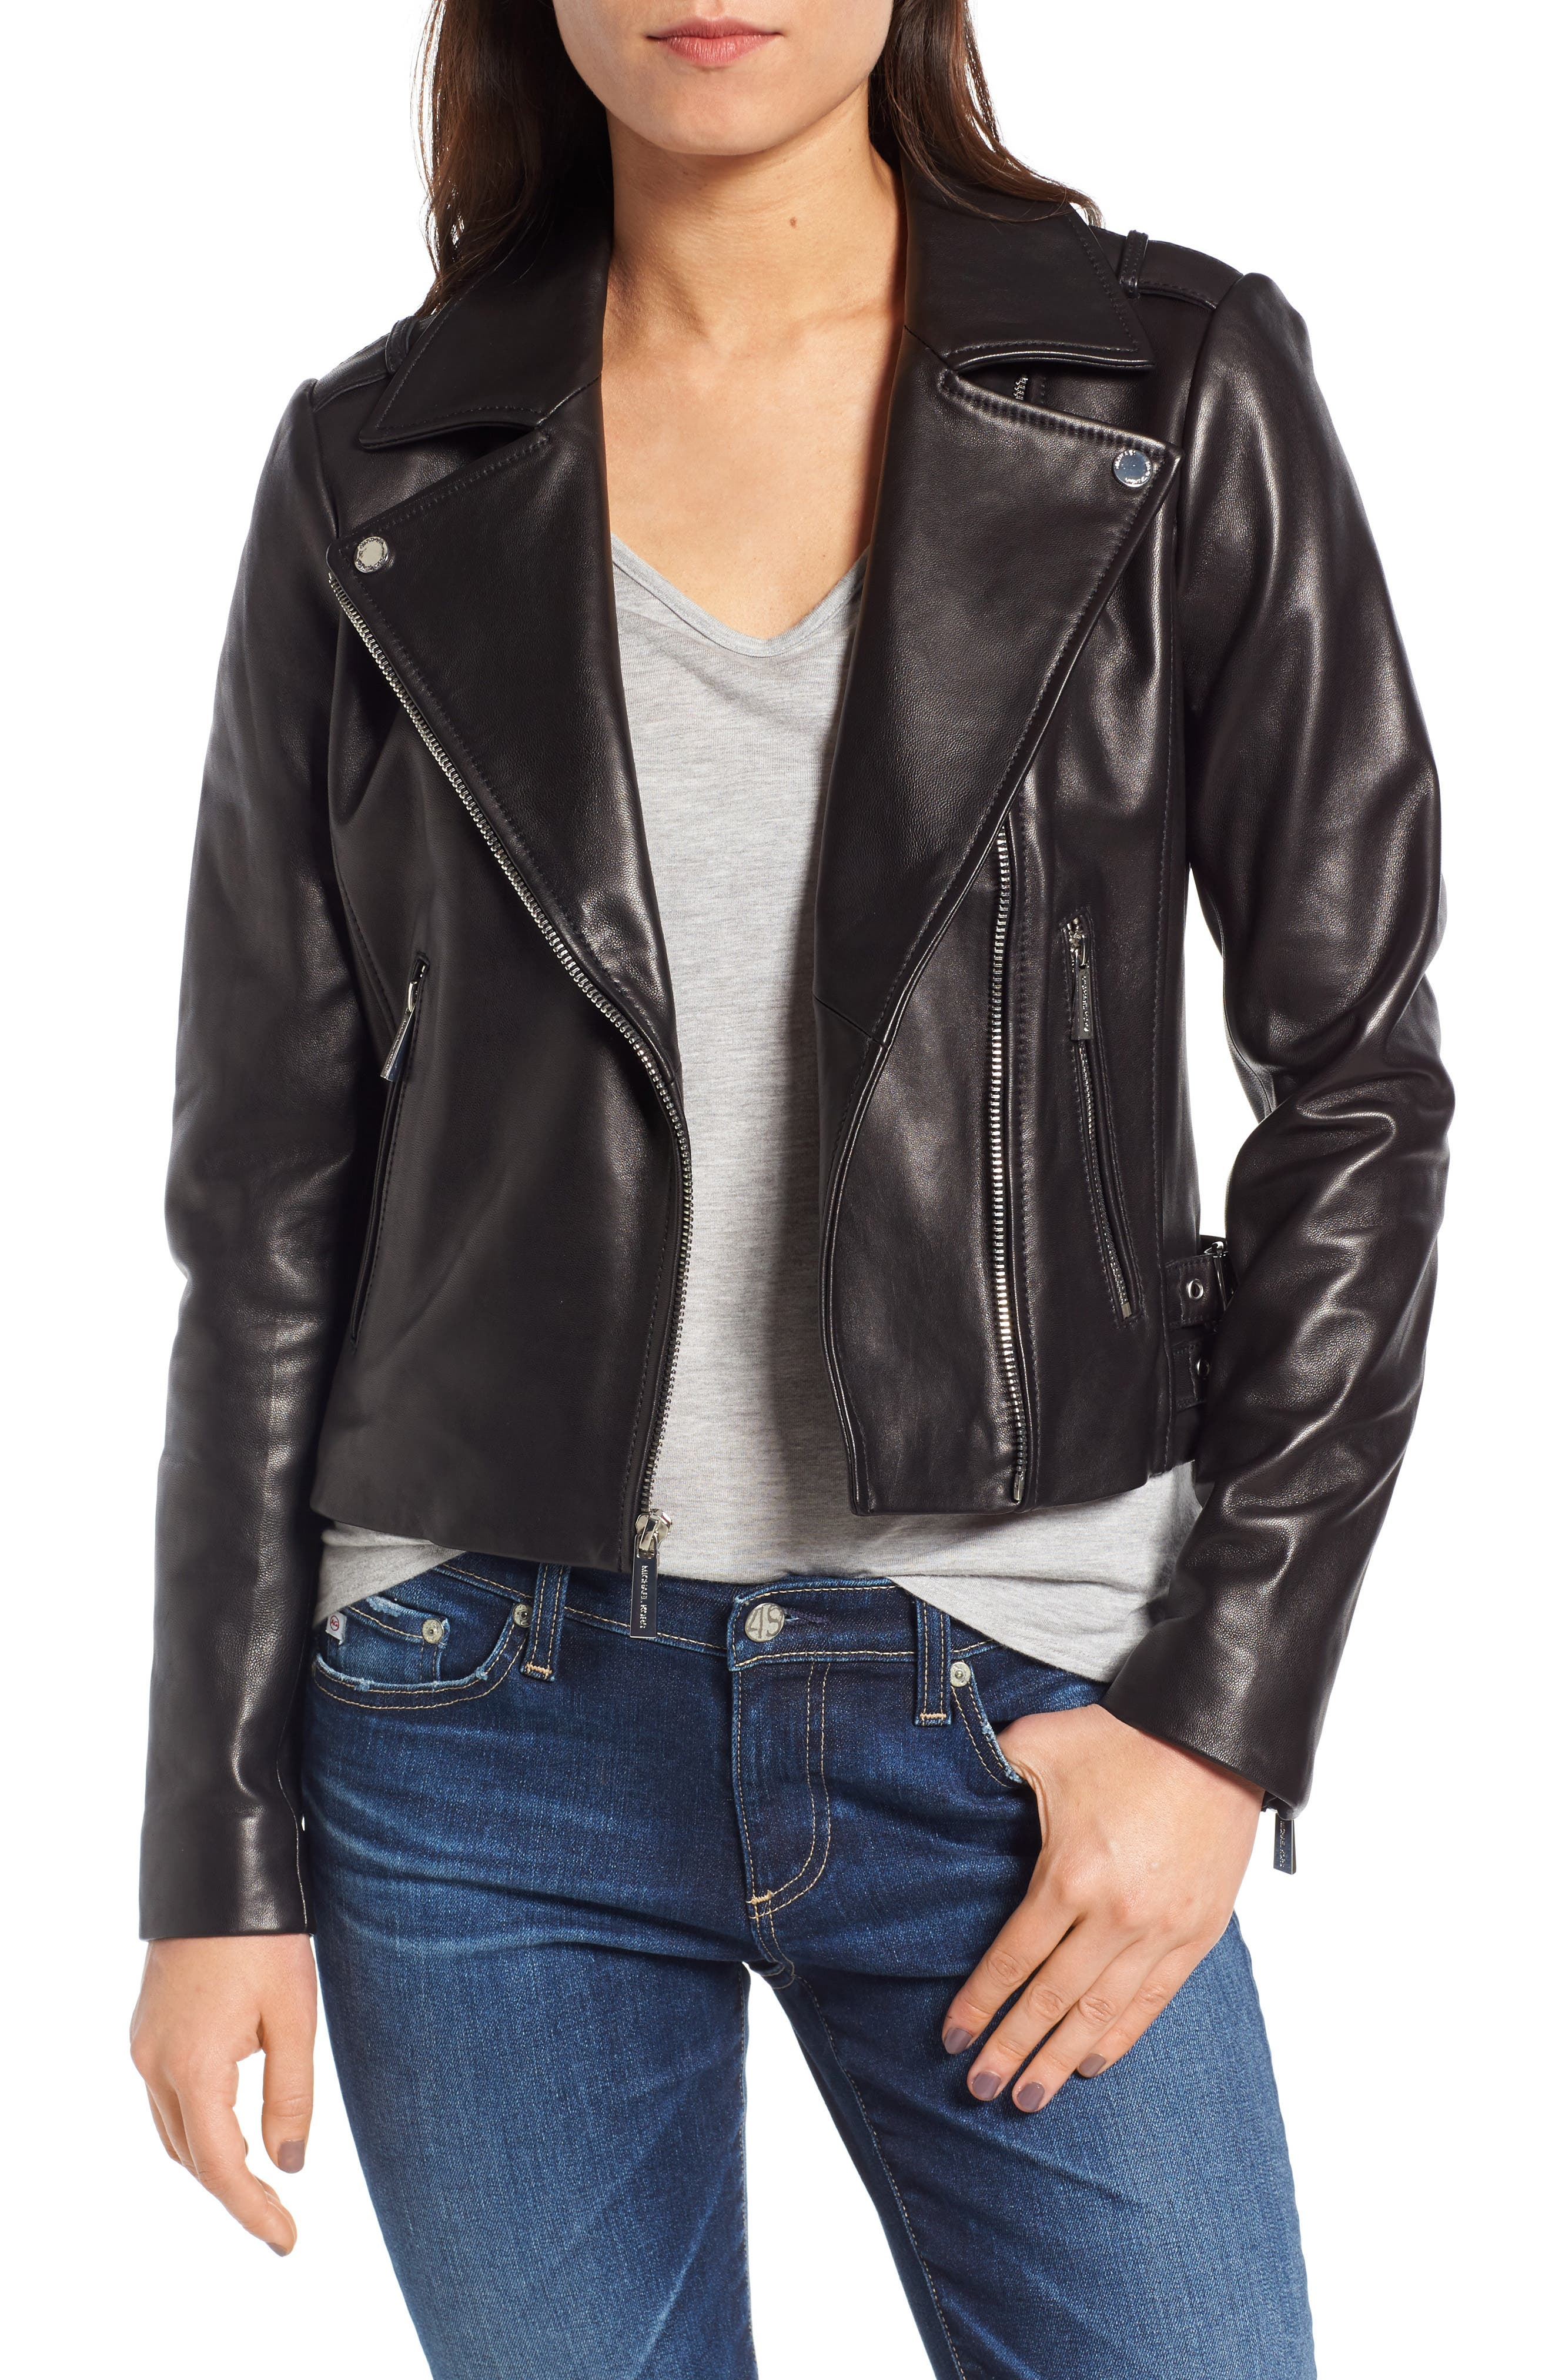 Michael kors leather jacket ireland